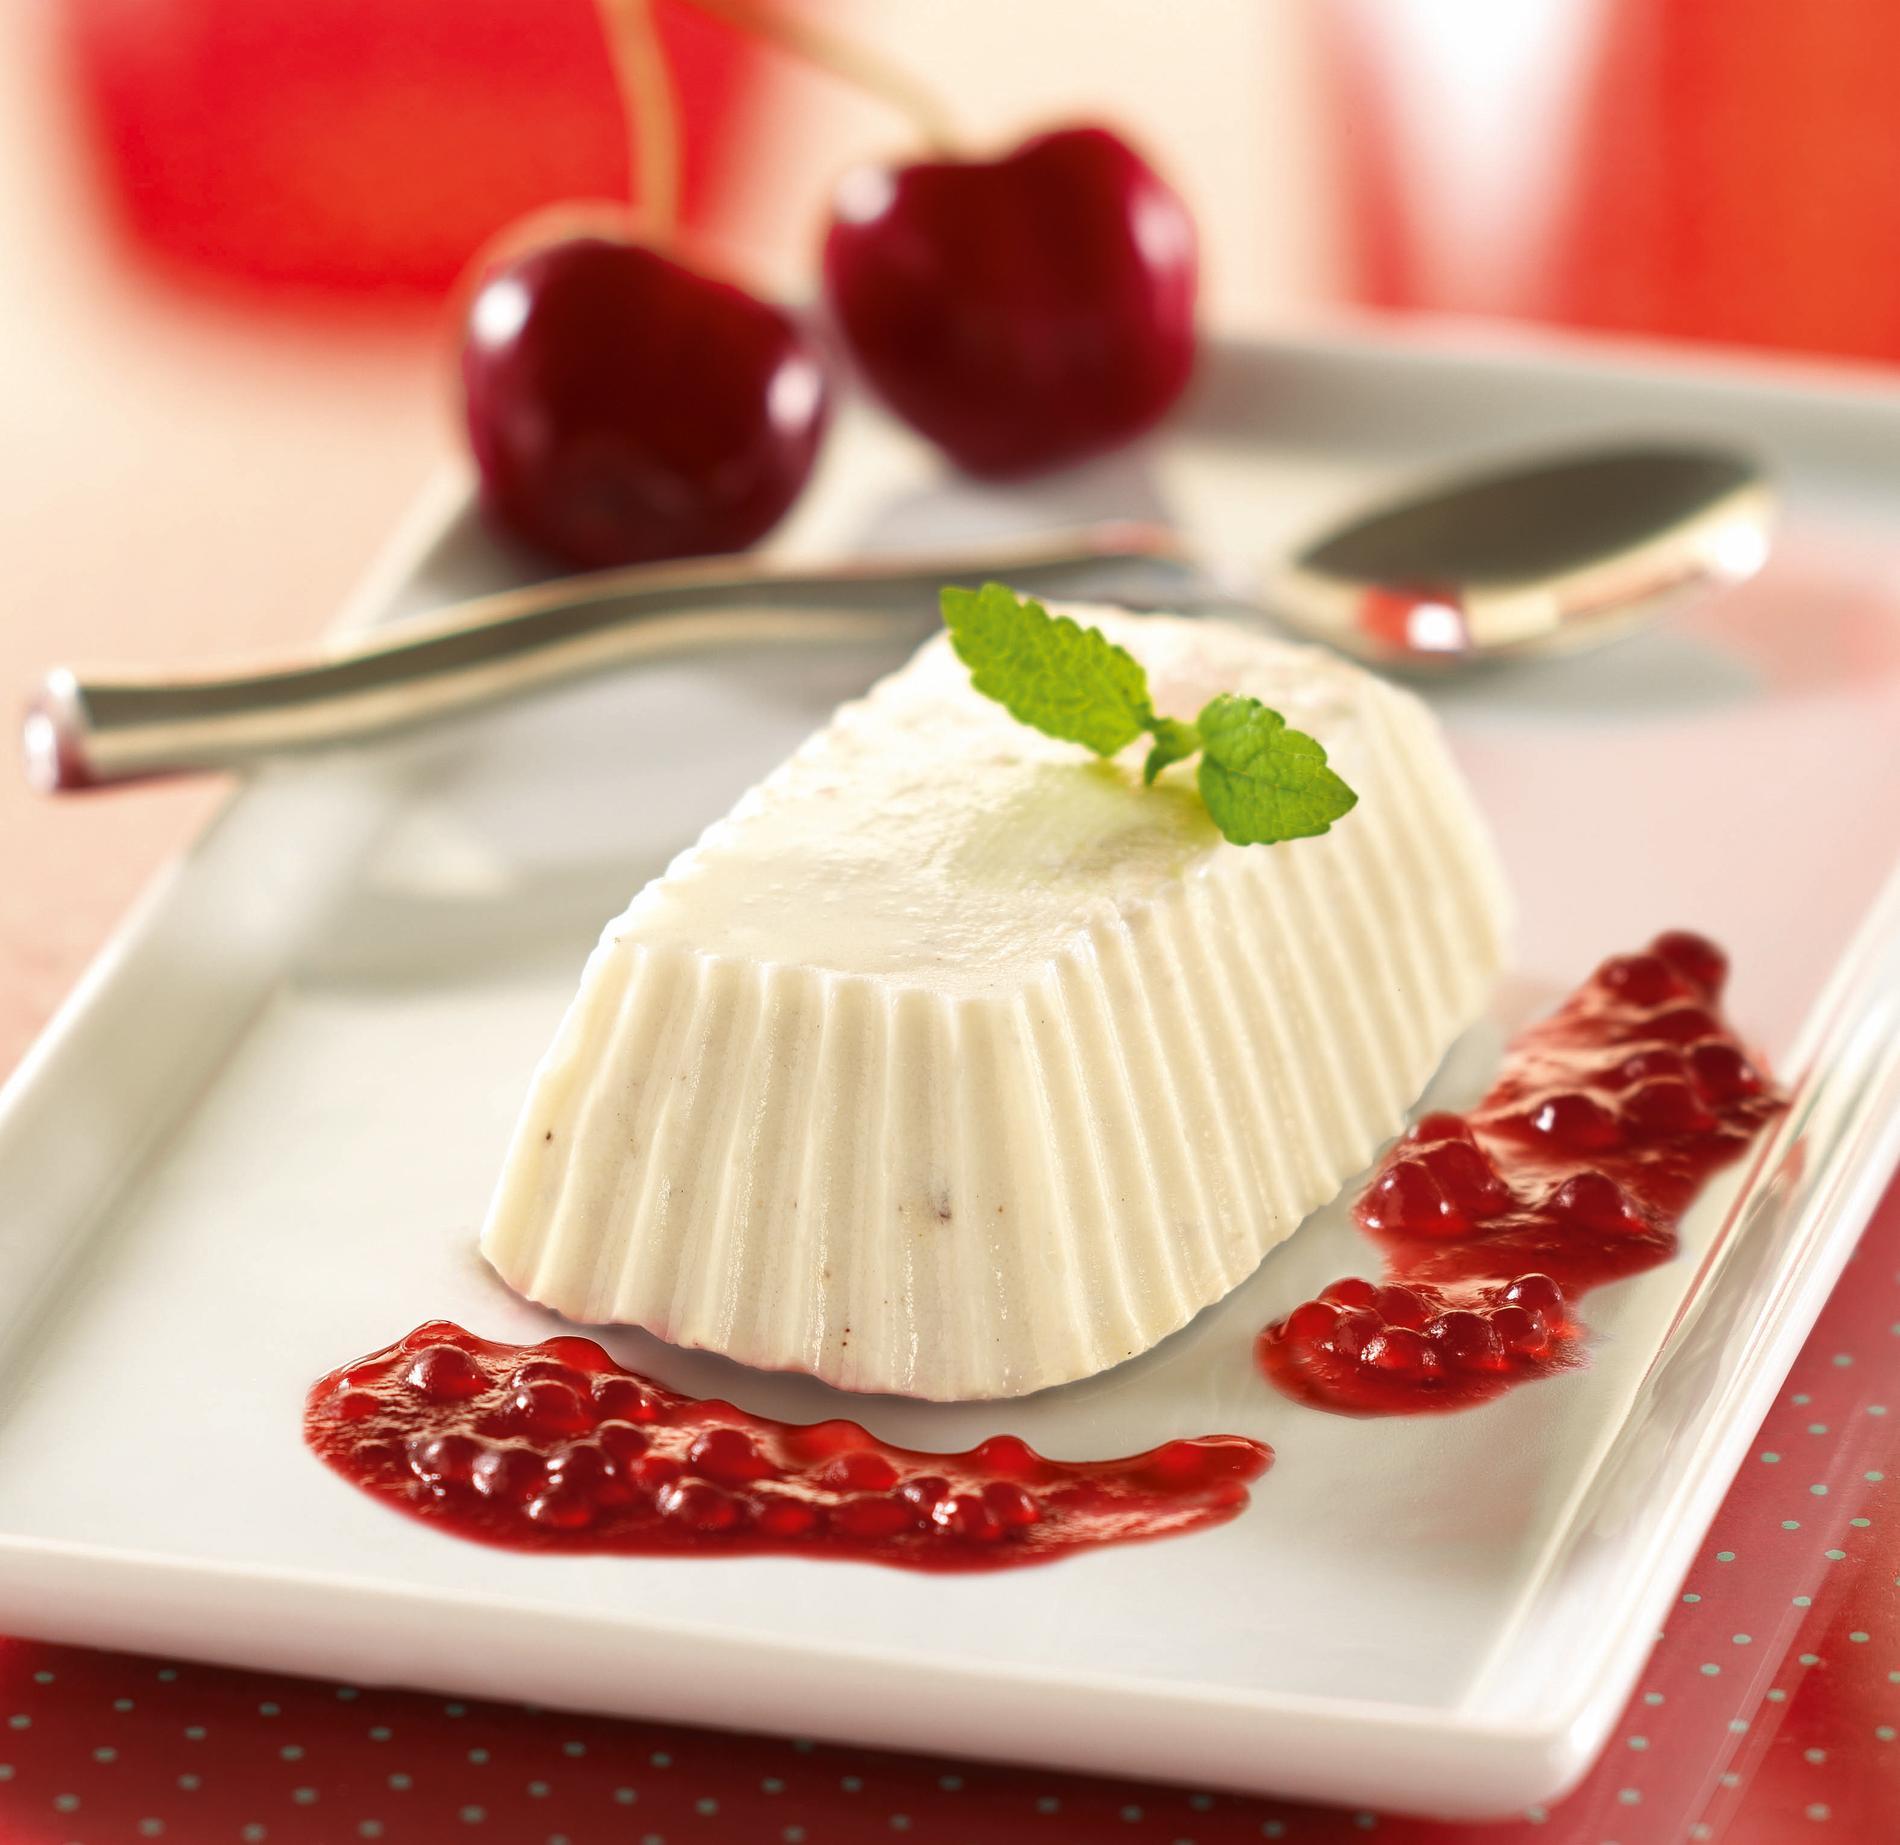 Recette panna cotta et sa gel e perl e la cerise cuisine madame figaro - Recette panna cotta mascarpone ...